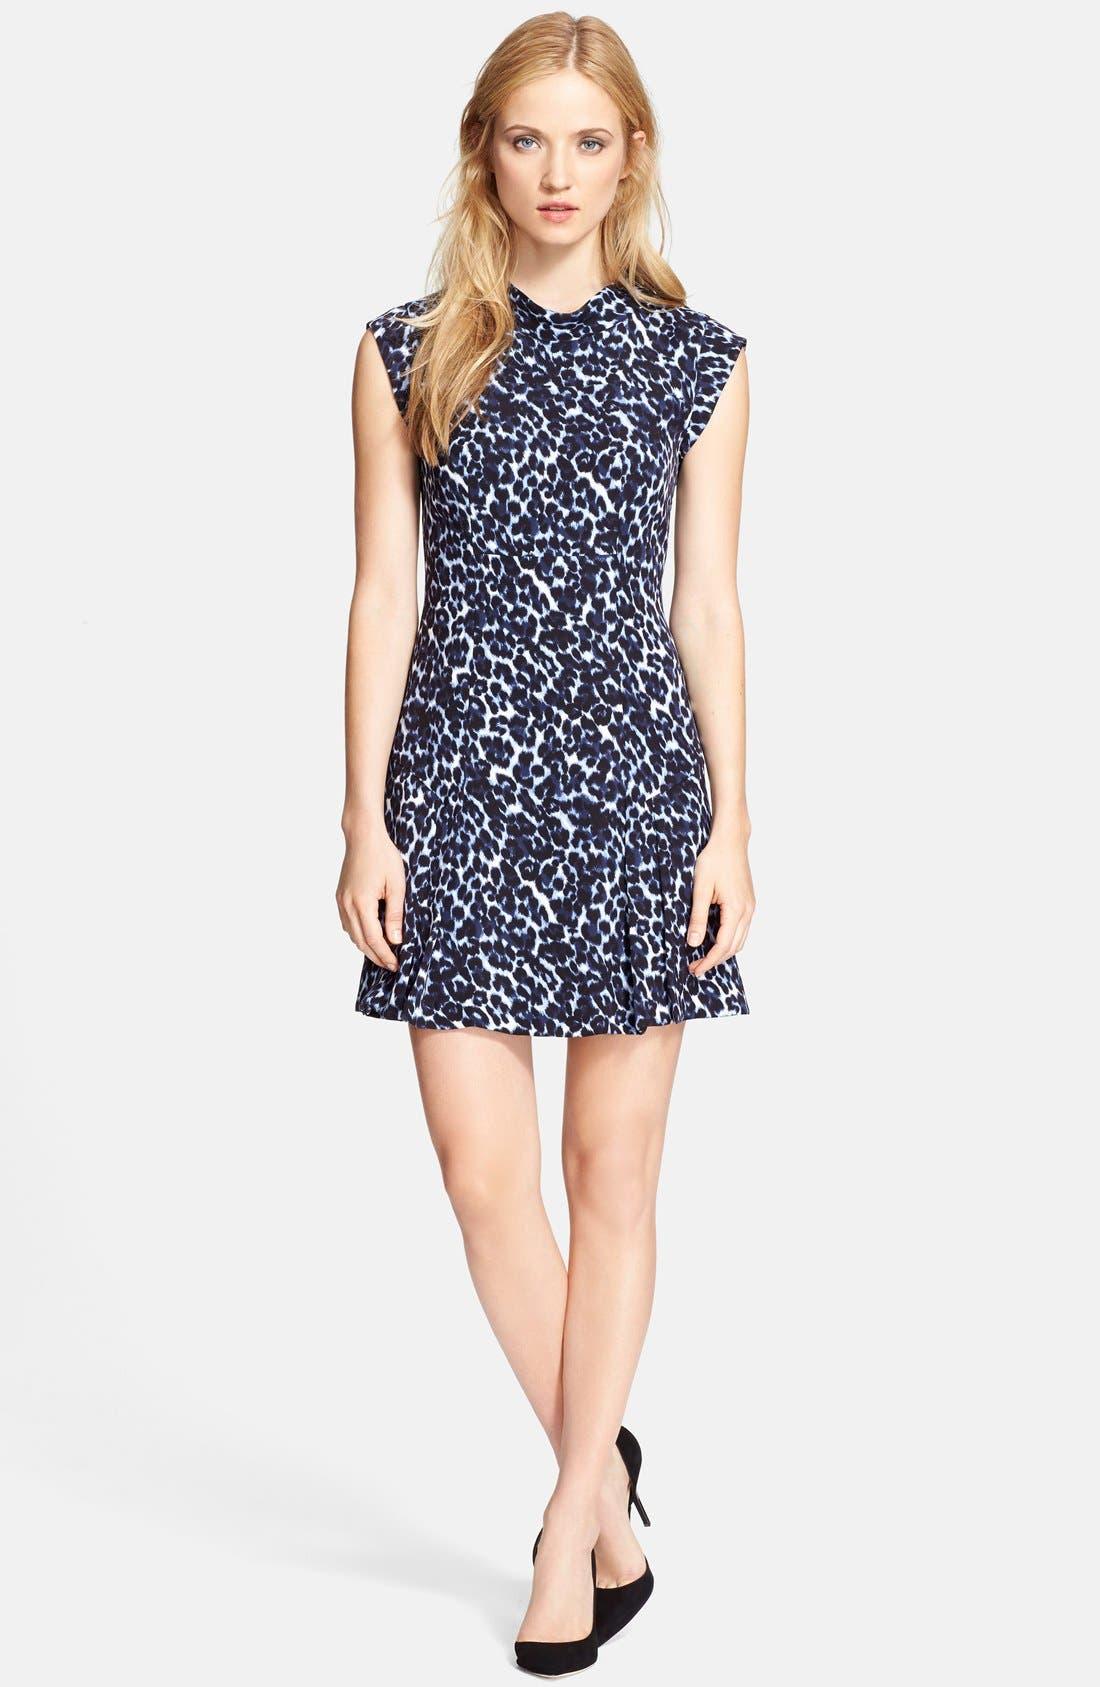 Alternate Image 1 Selected - Rebecca Taylor Sleeveless Mock Neck Dress